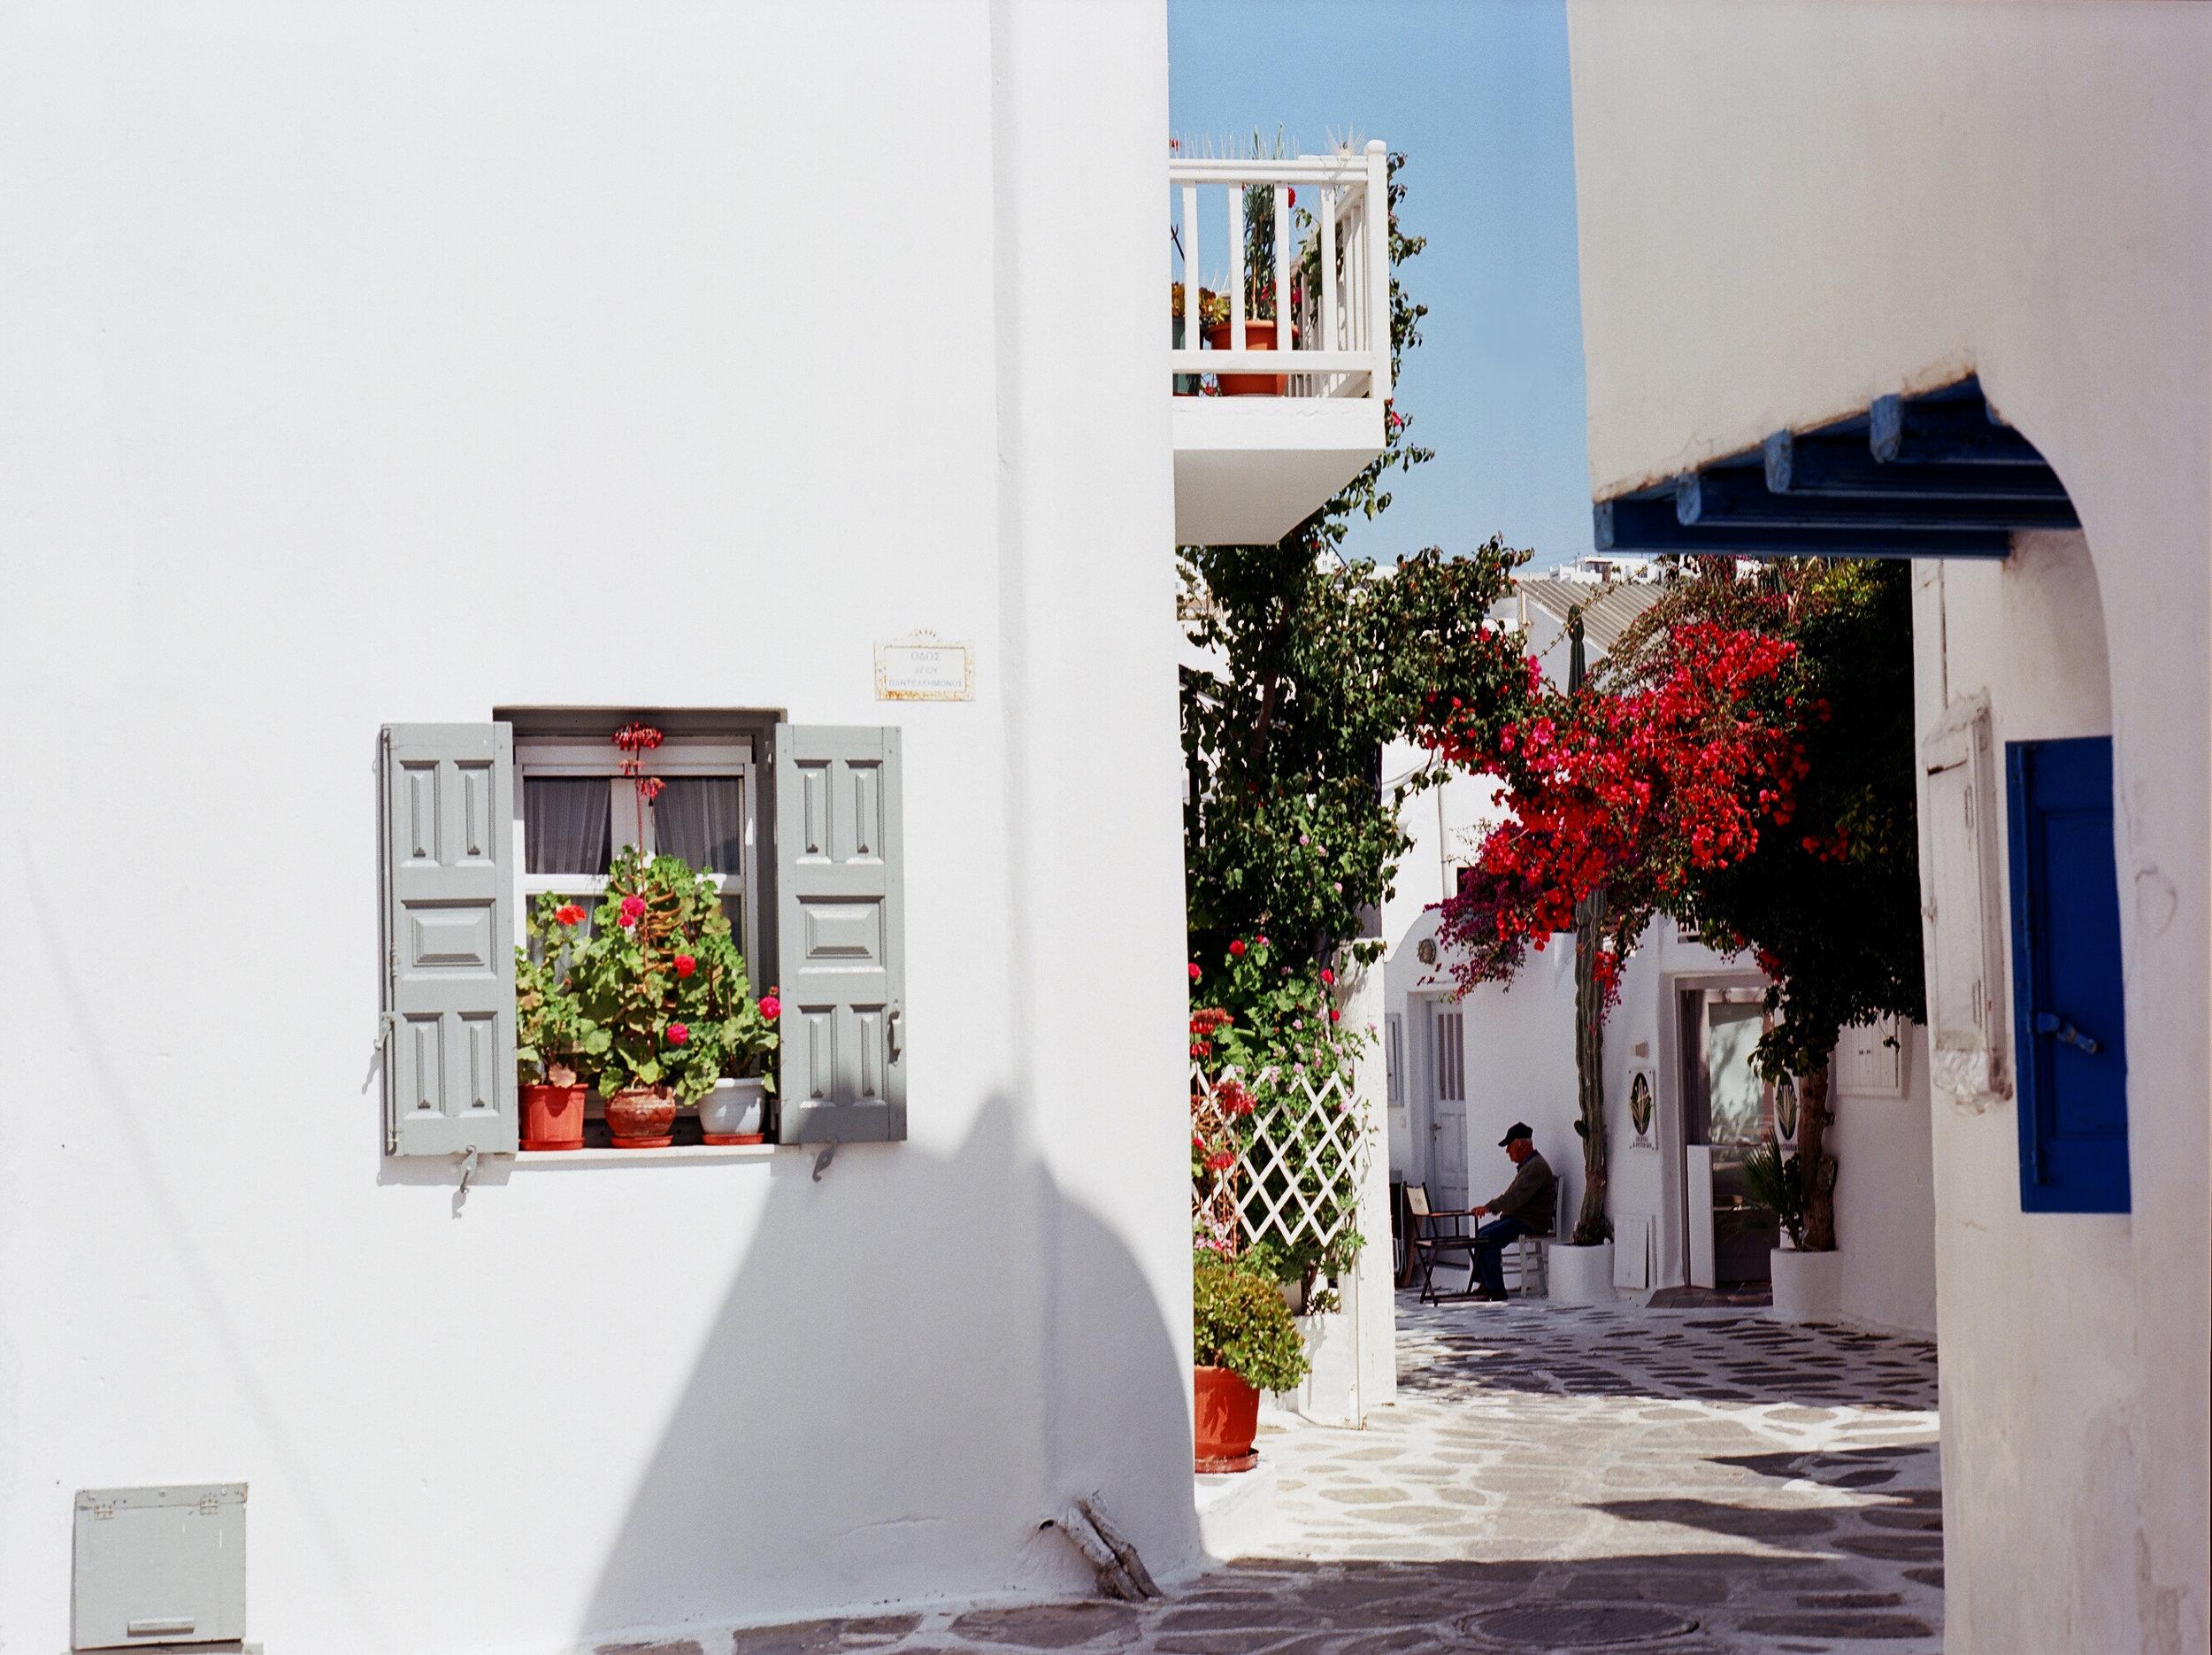 GREECE! - View photos from Athens, Santorini and Mykonos